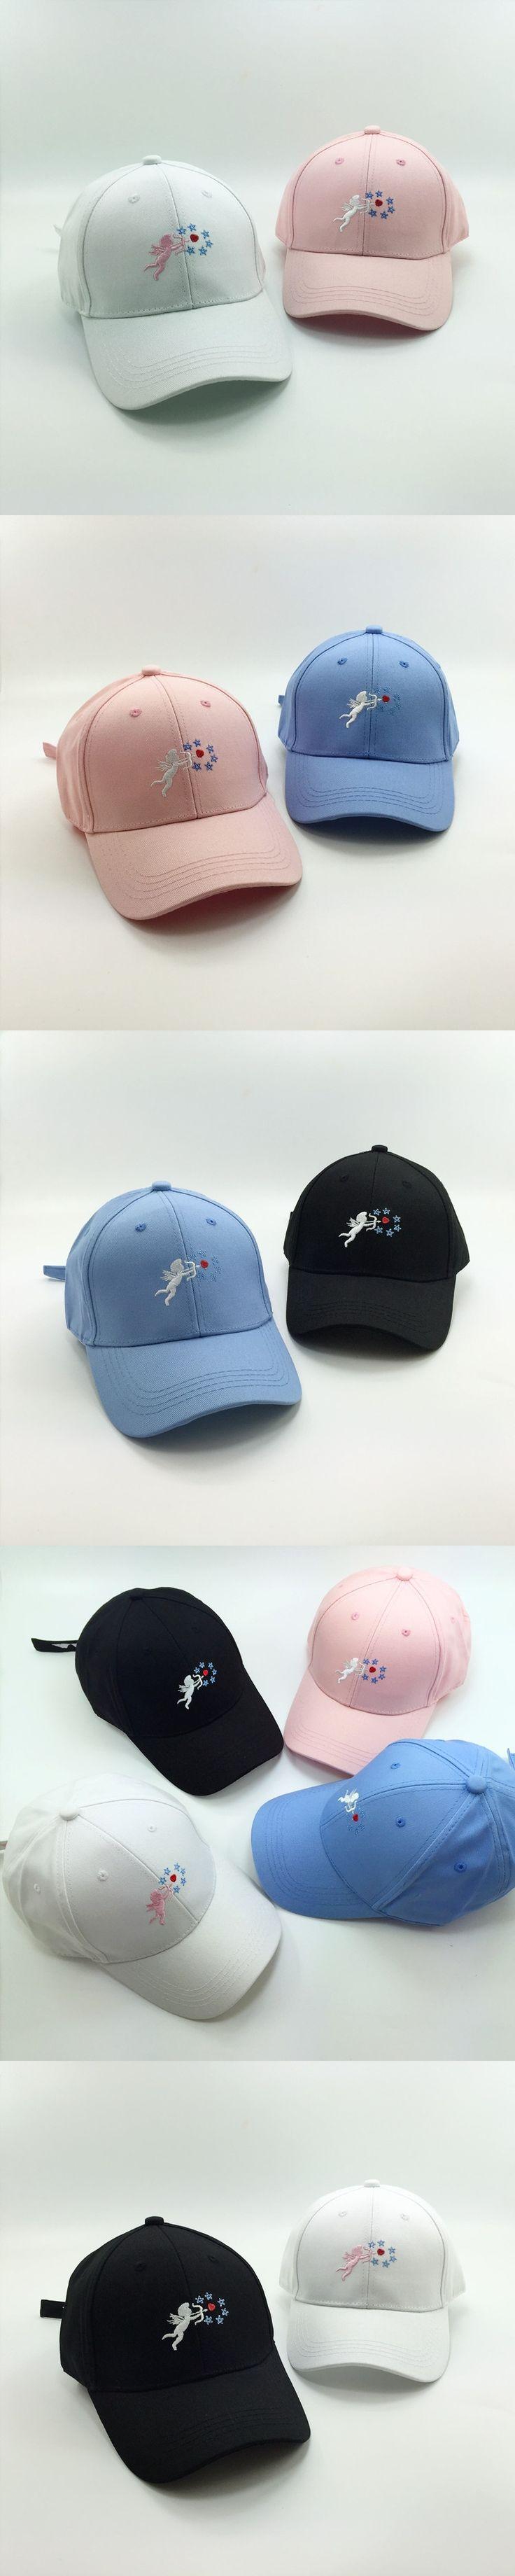 Wholesale Gorras Hip Hop 2016 Summer New Korea Ulzzang Harajuku Novelty Baseball Cap For Men And Women Lovely Pink Snapback Hats